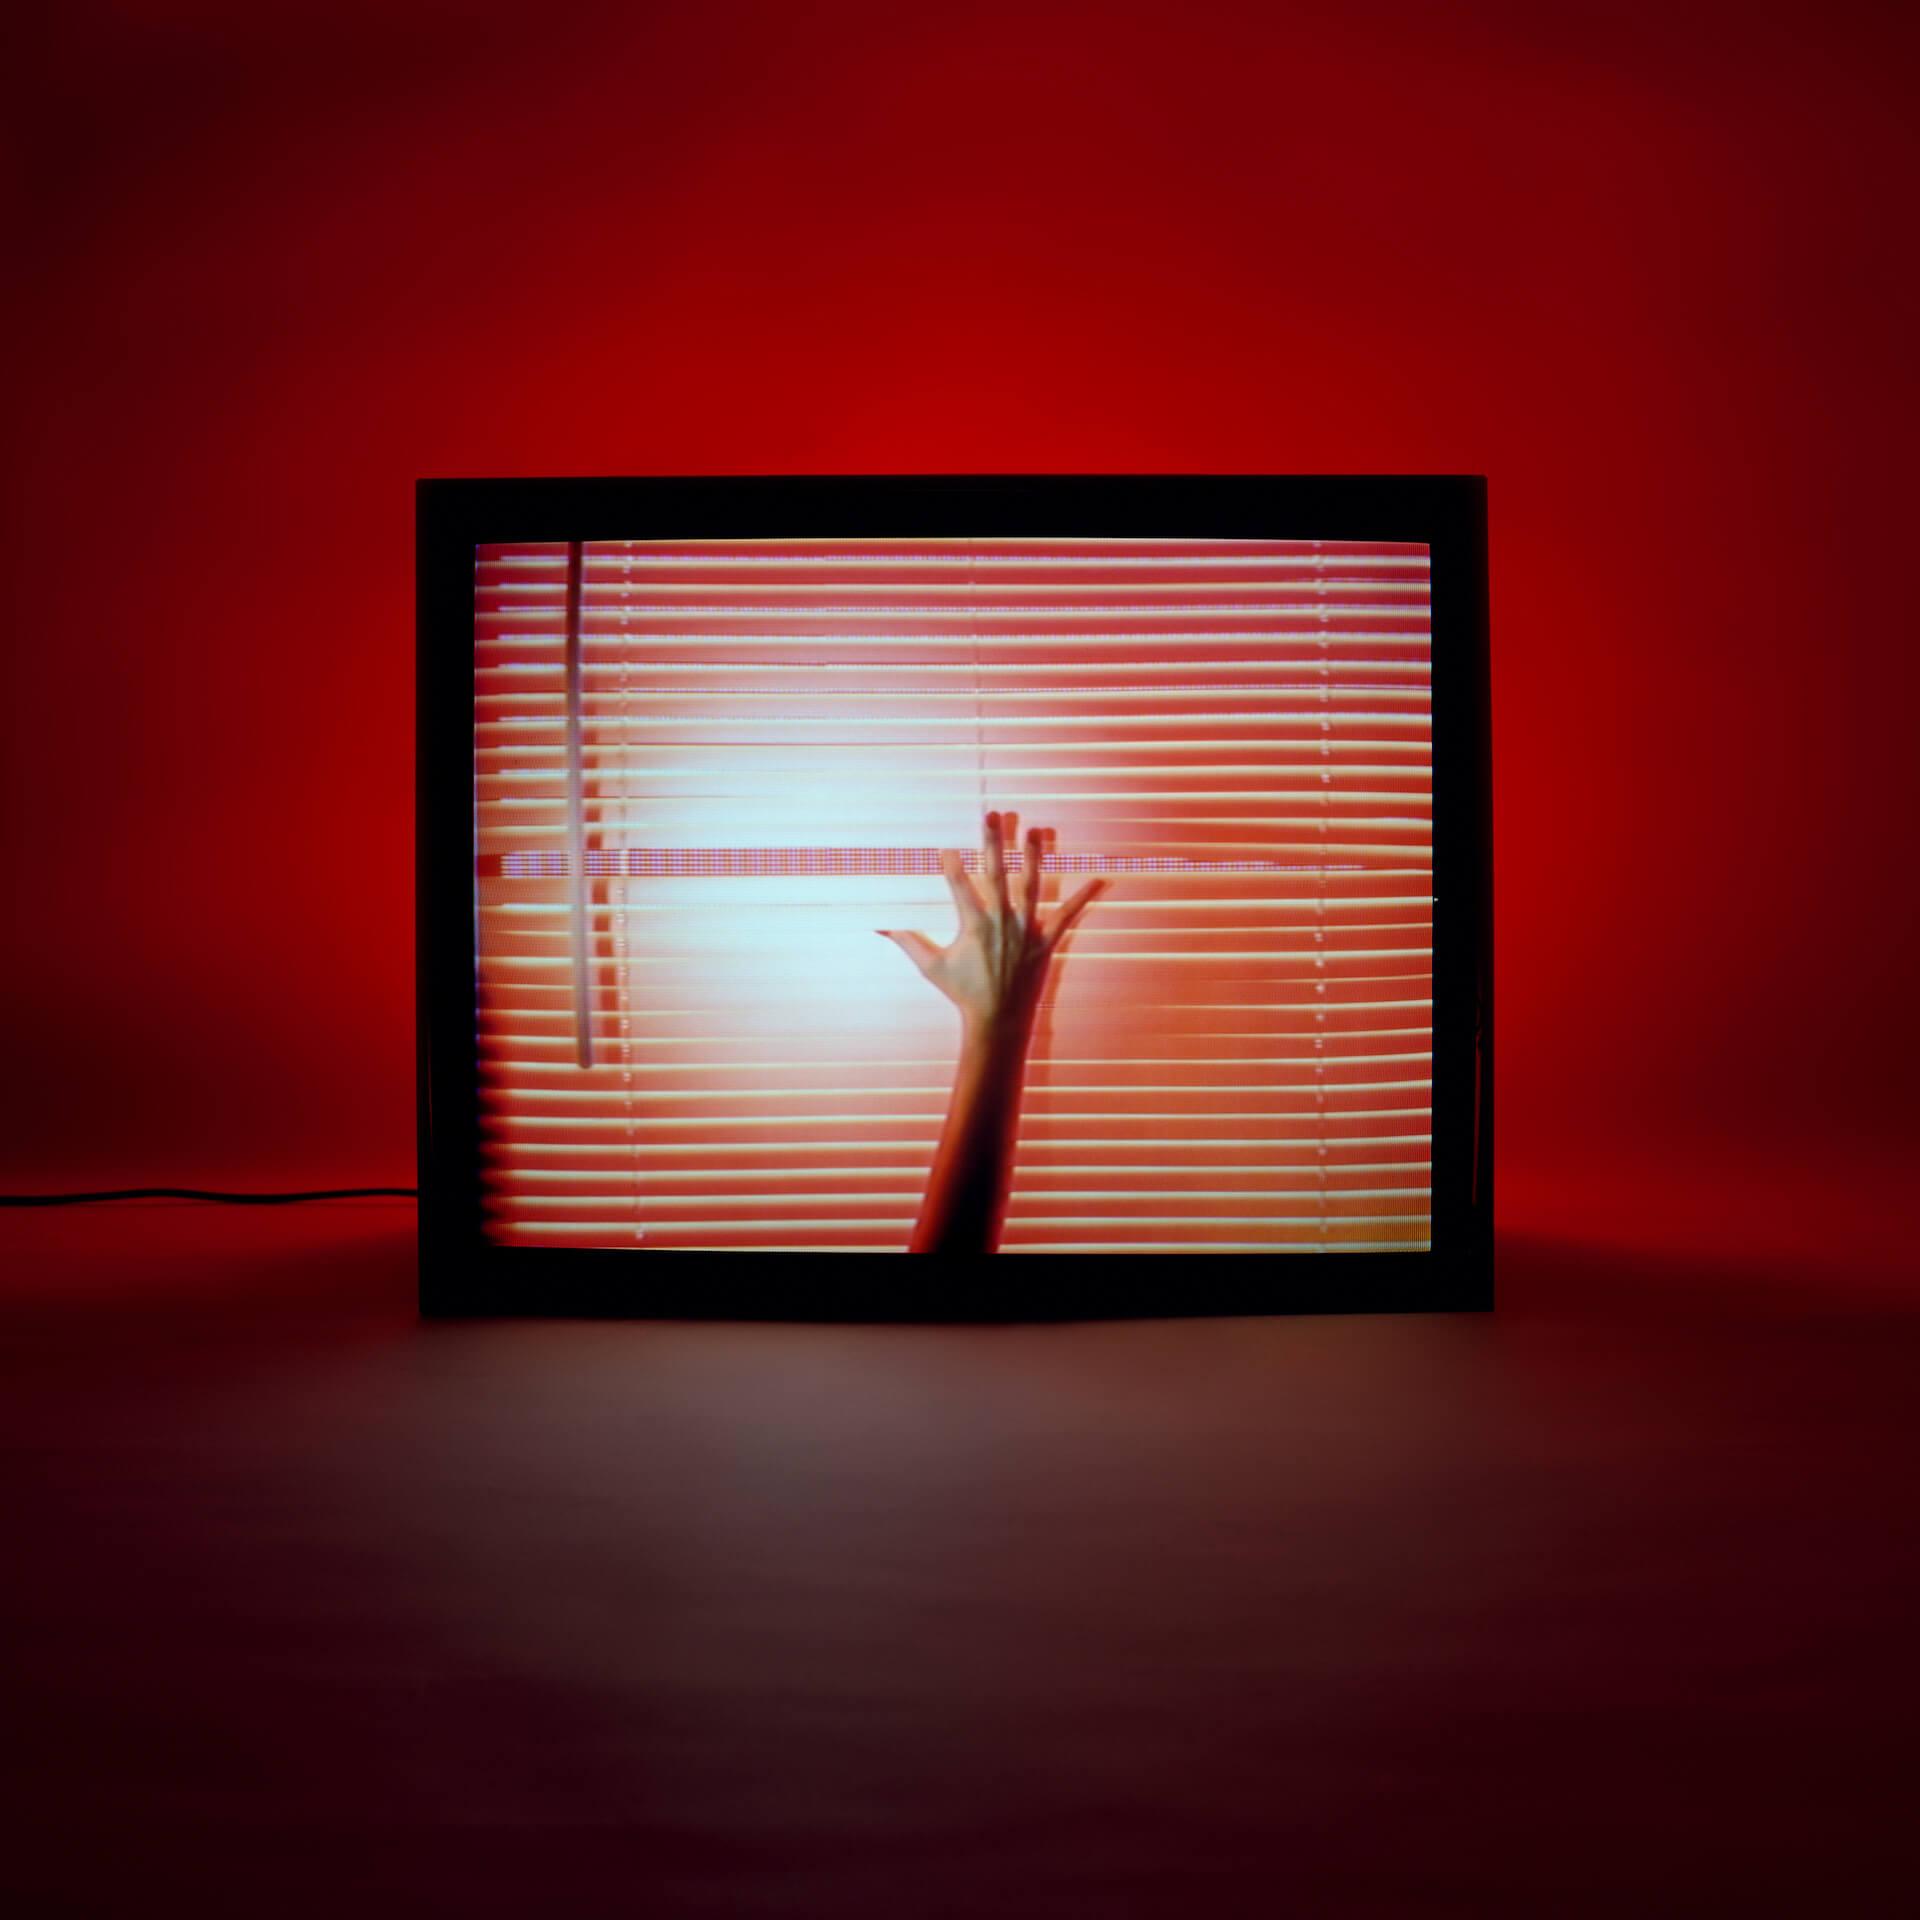 CHVRCHES最新アルバム『Screen Violence』発売記念!タワレコでサイン入り豪華特典が当たるキャンペーン実施決定 music210824_chvrches_6